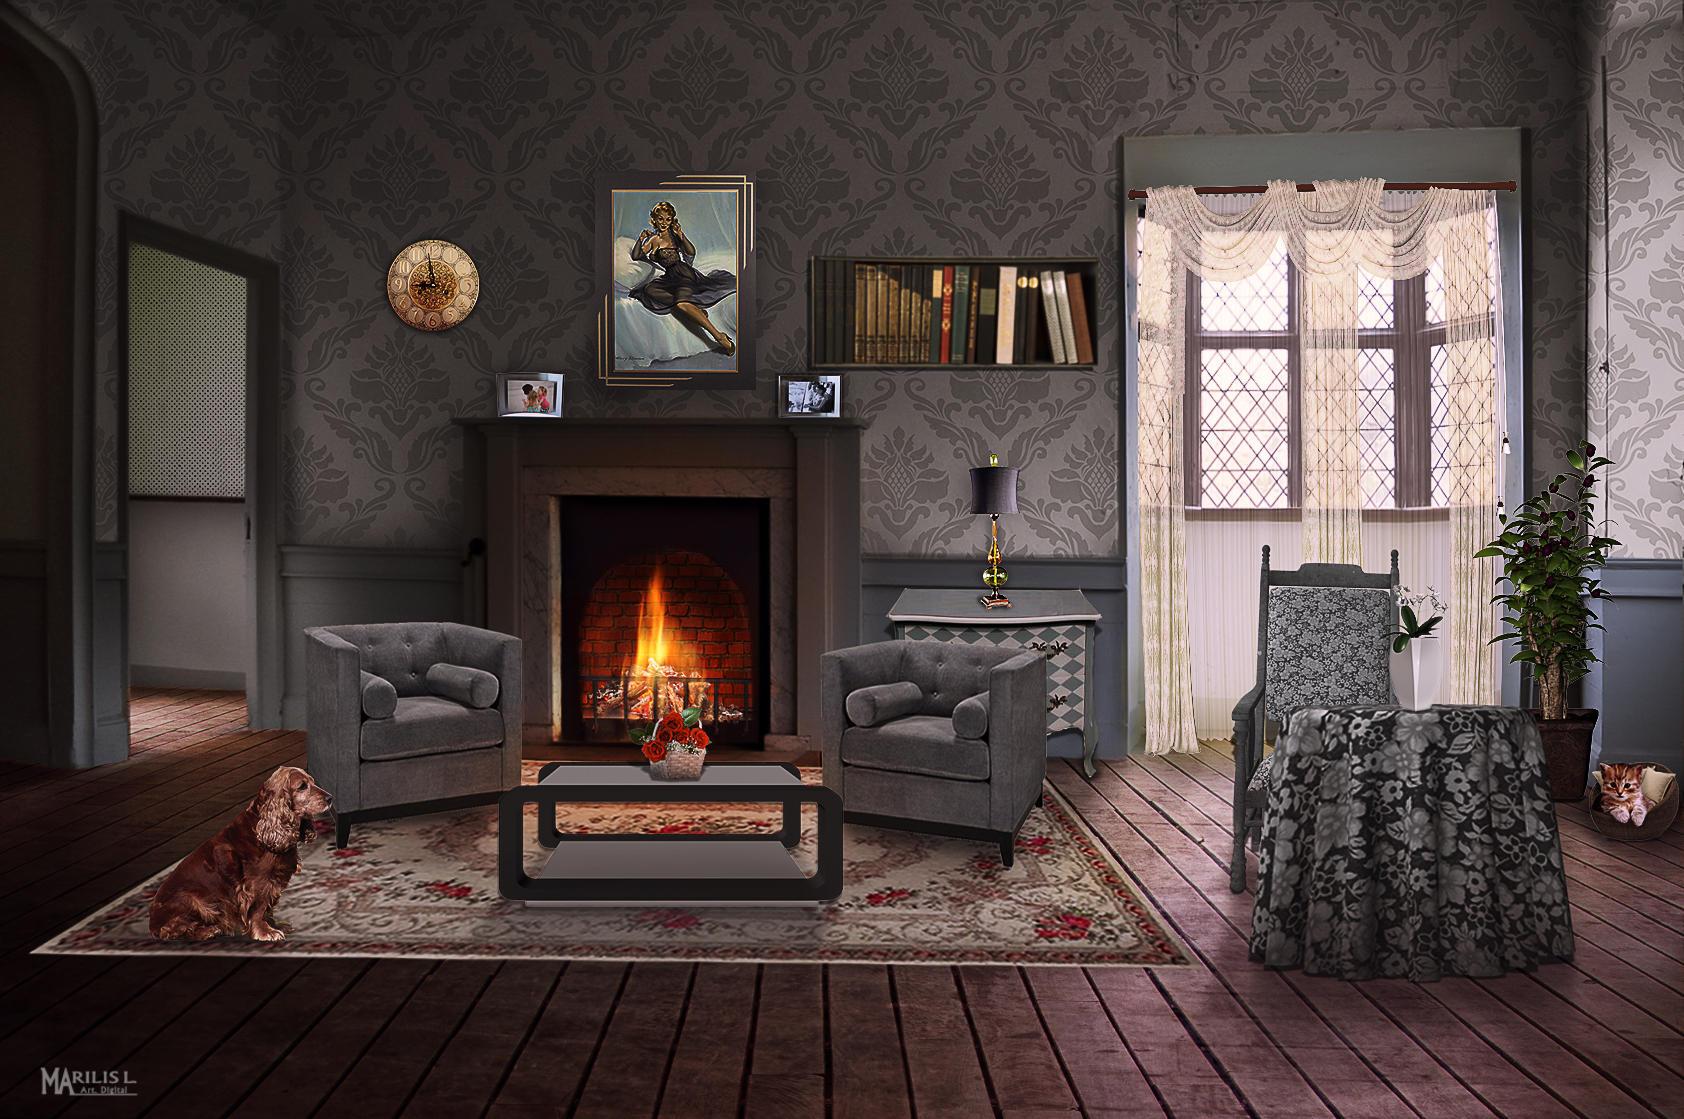 Living room by Marilis5604